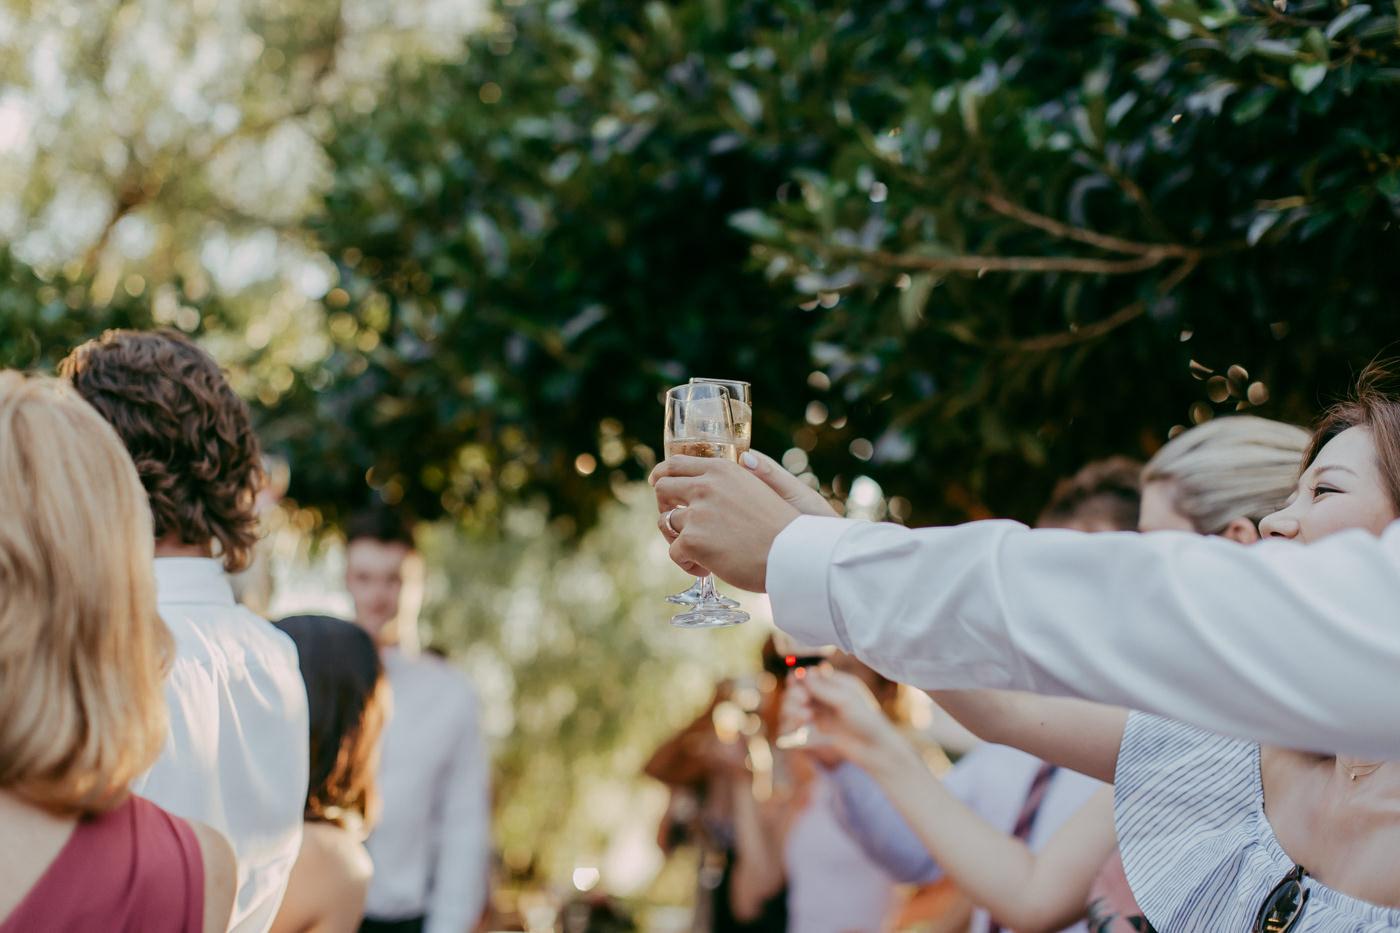 Anthony & Eliet - Wagga Wagga Wedding - Country NSW - Samantha Heather Photography-142.jpg